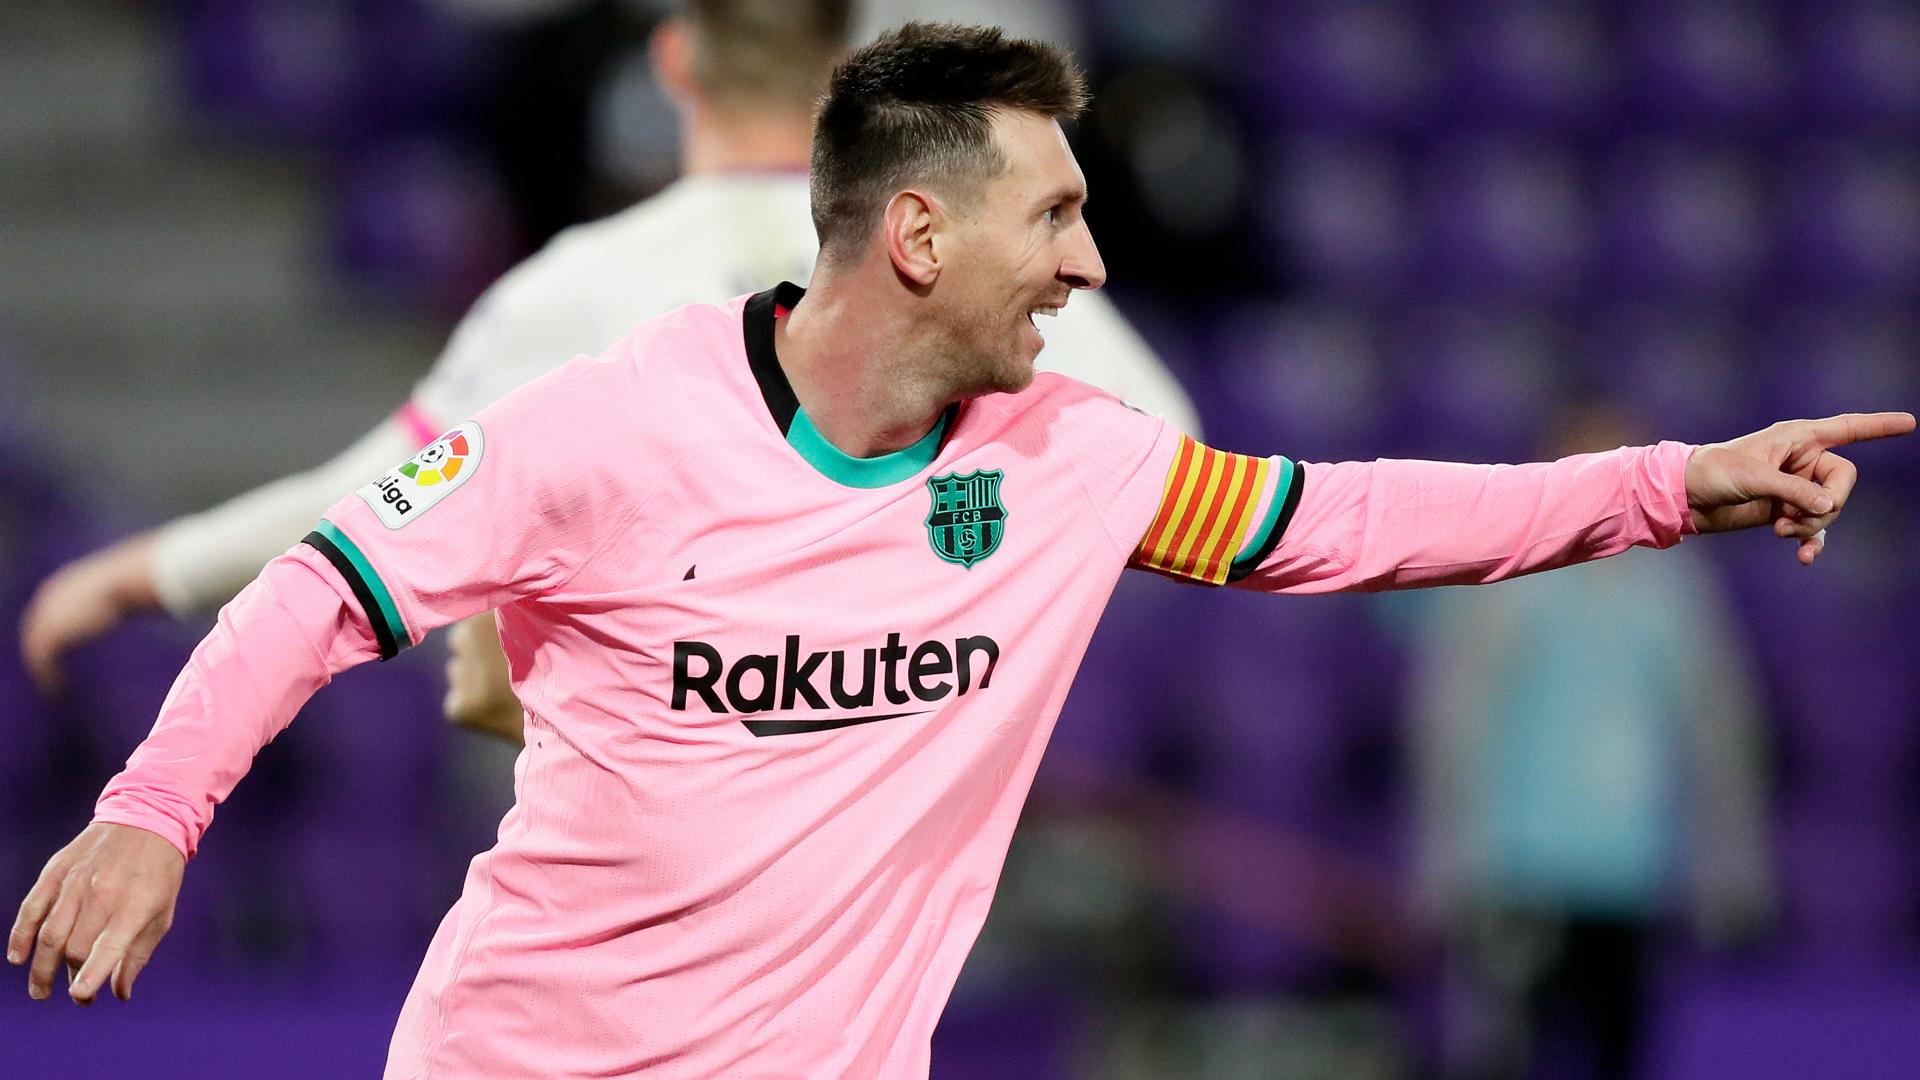 Real Valladolid 0-3 Barcelona: Messi overtakes Pele as Koeman's side end winless away run